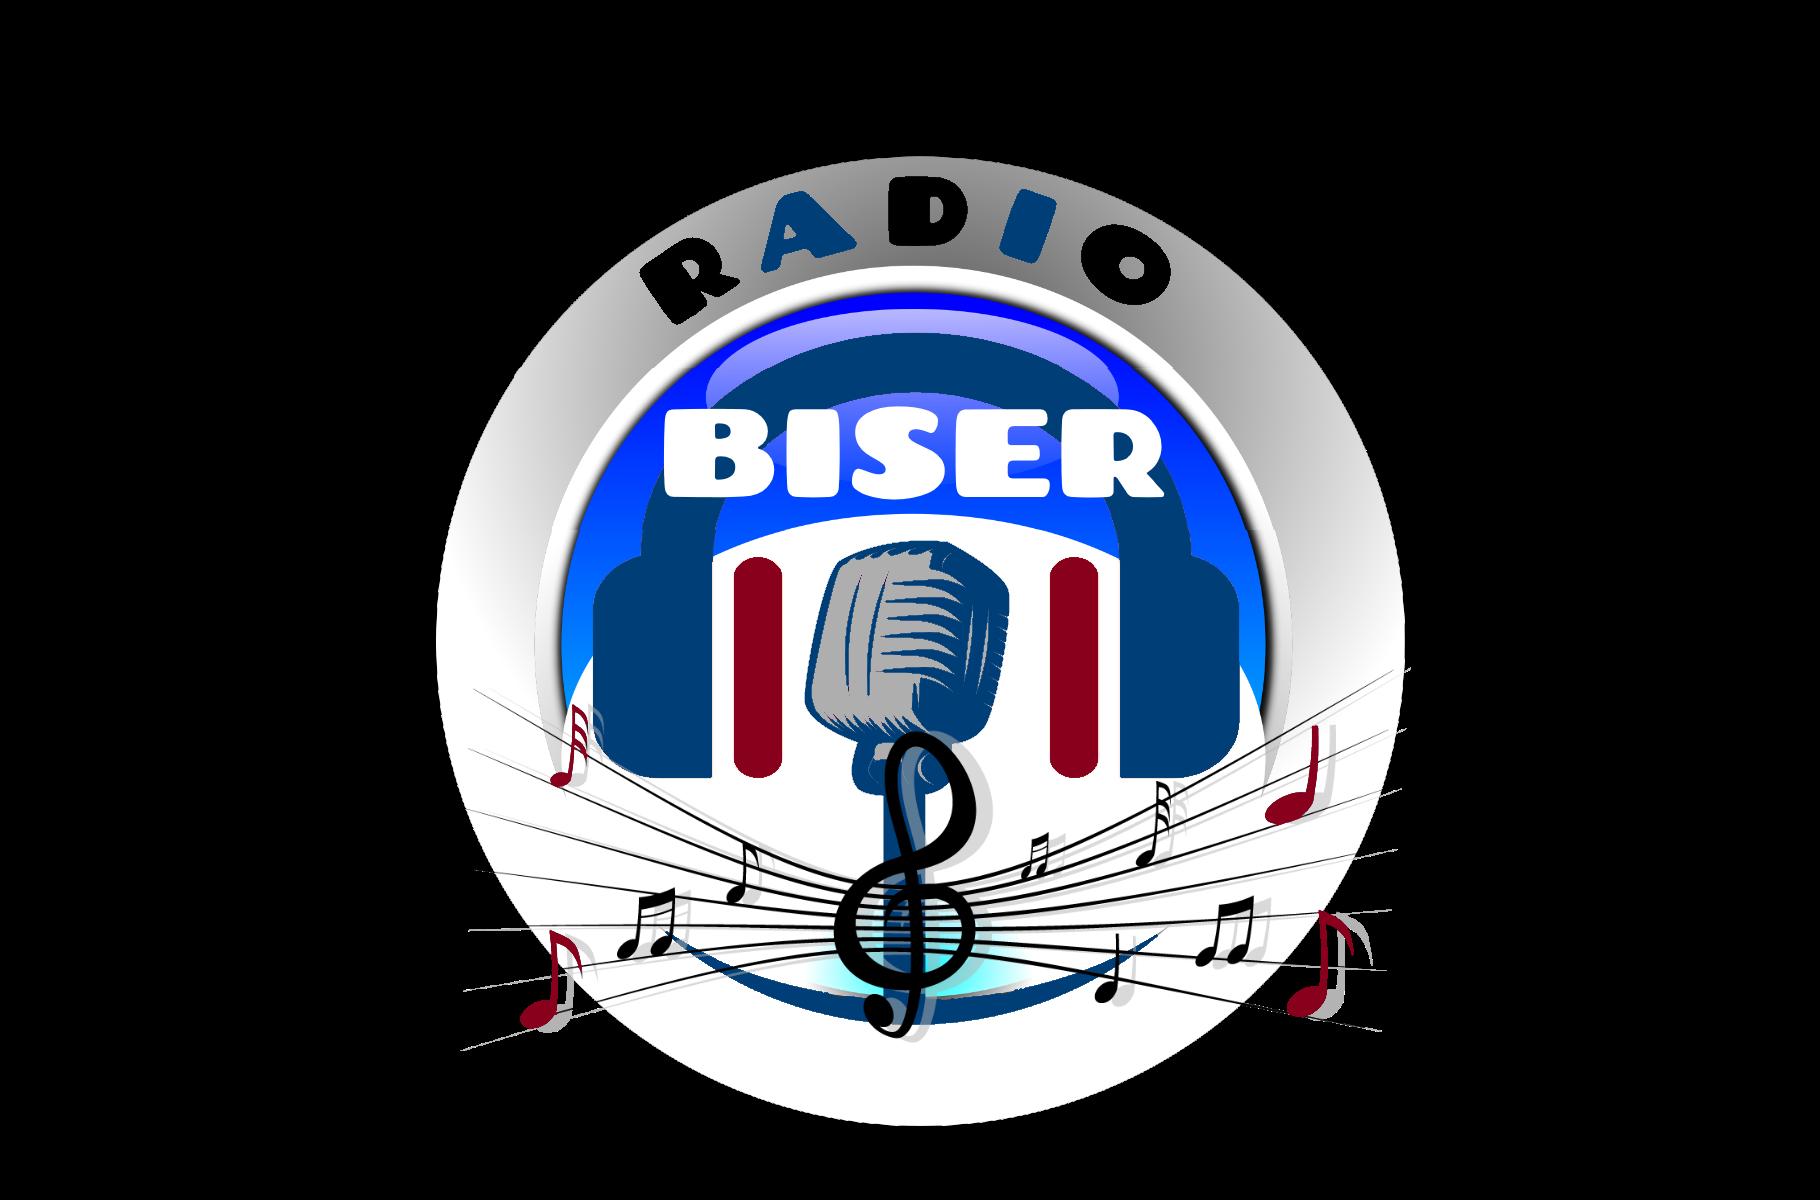 Biser Radio Reykjavik Island